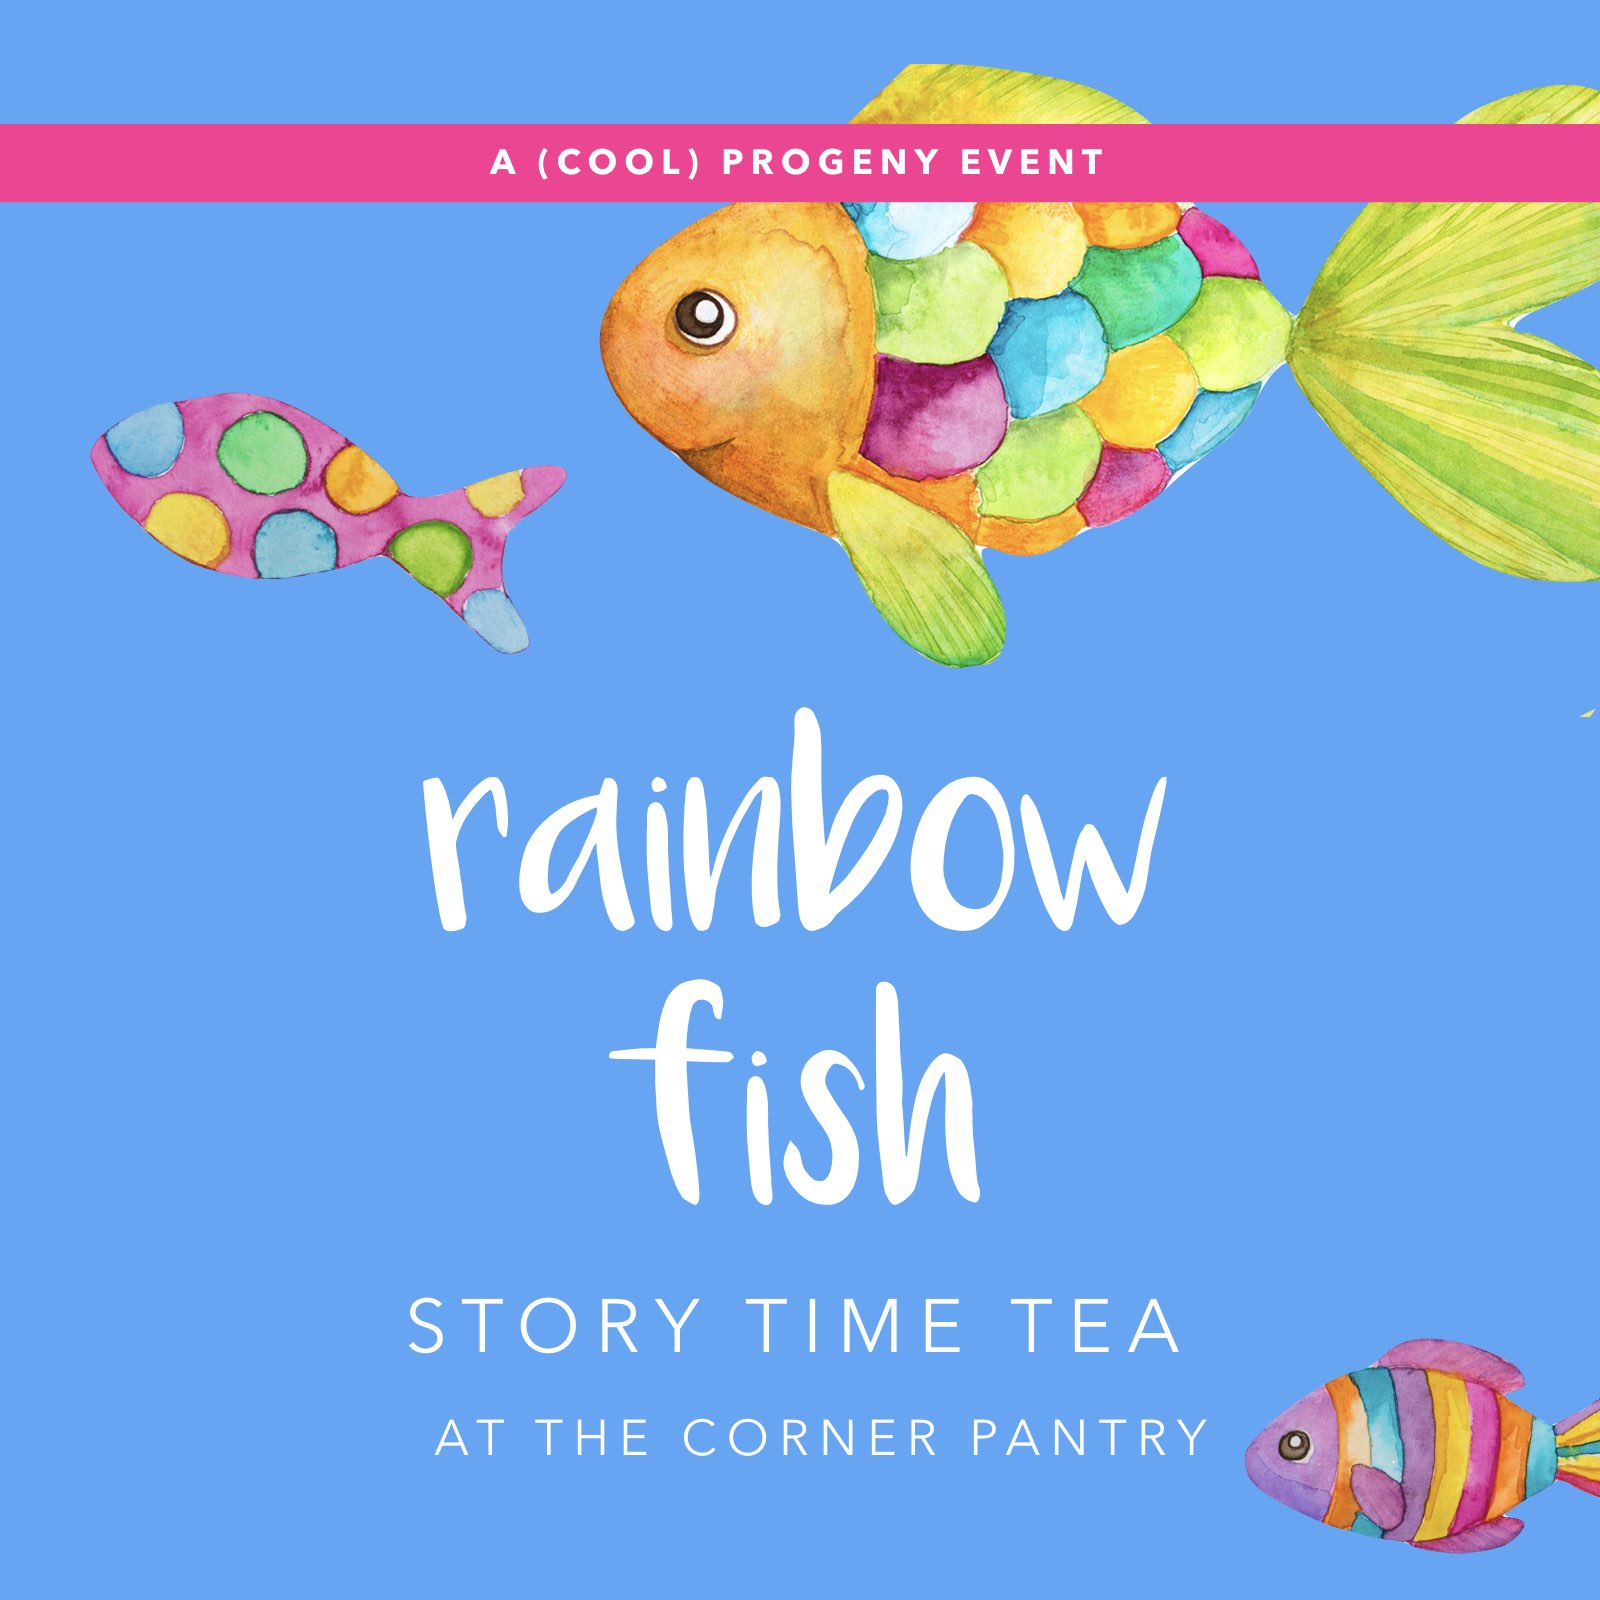 Rainbow Fish Story Time Tea - (cool) progeny